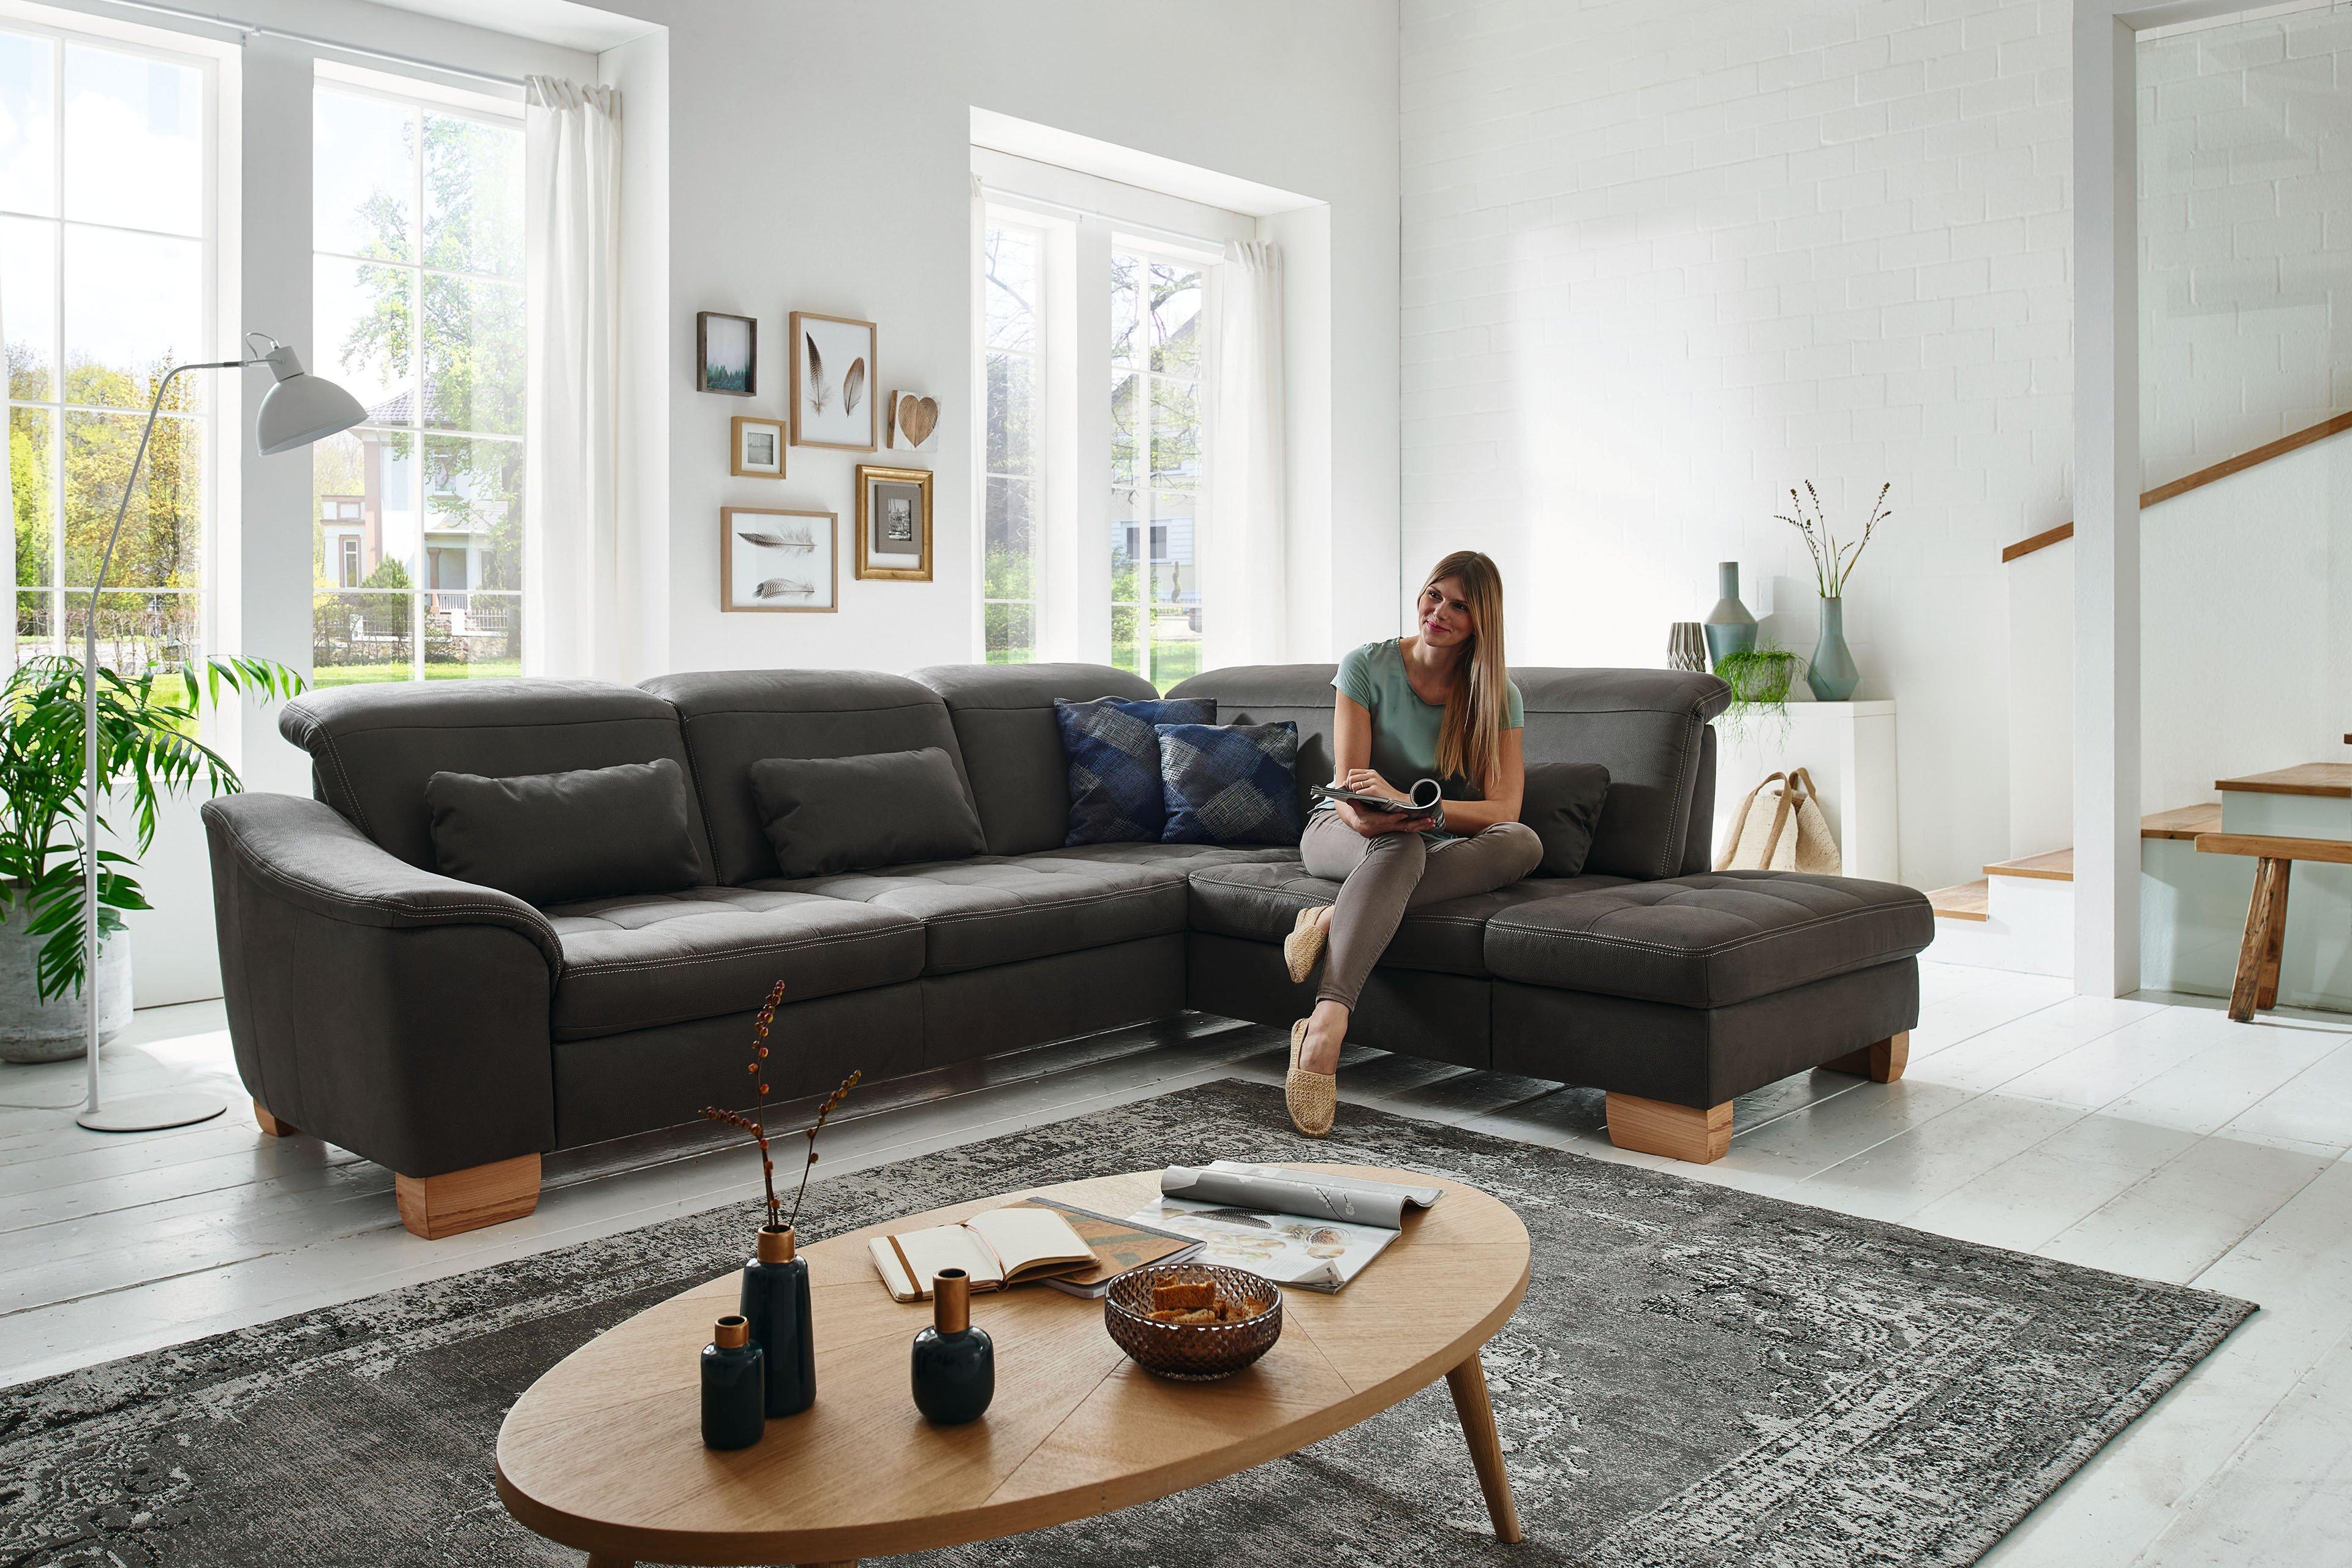 polipol infinity ecksofa in grau m bel letz ihr online shop. Black Bedroom Furniture Sets. Home Design Ideas